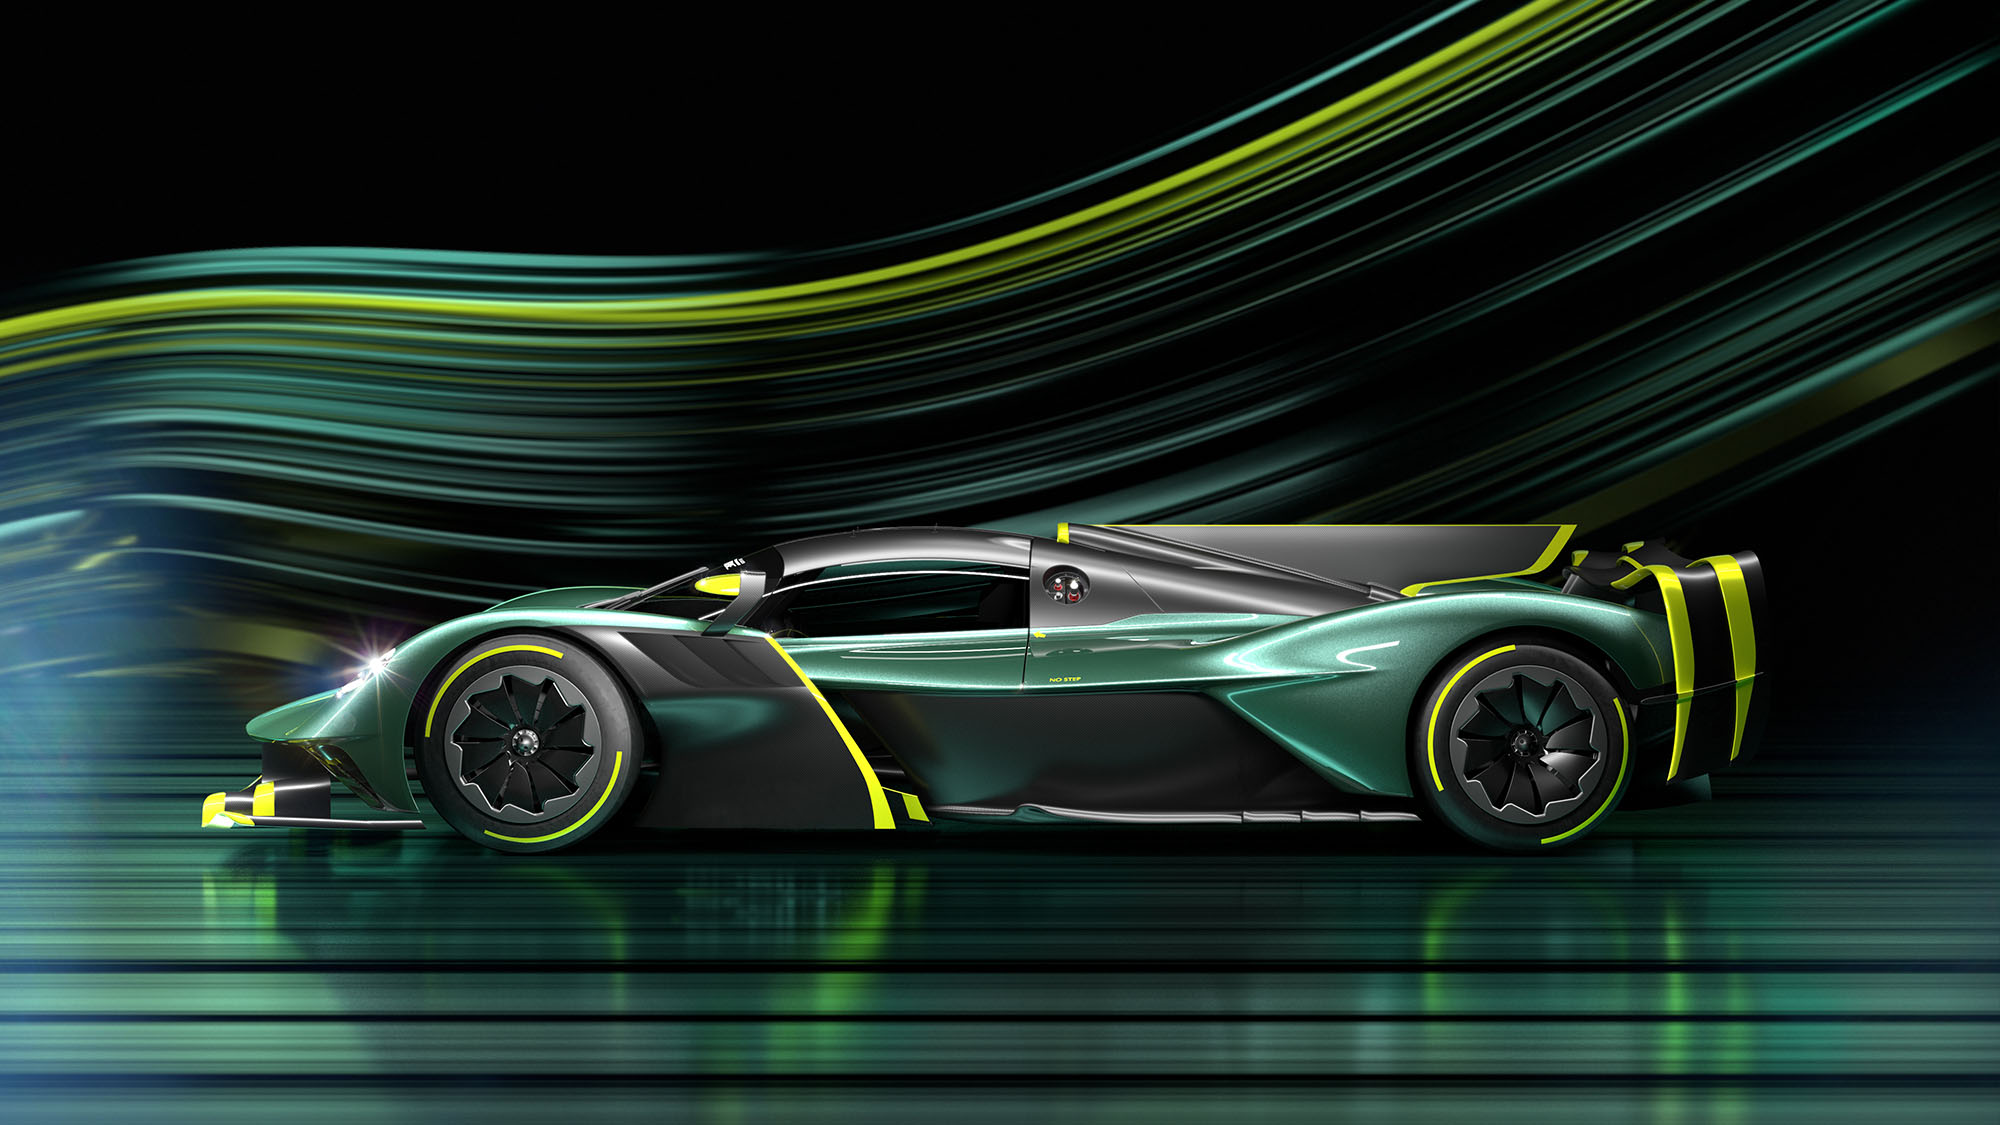 Aston Martin Valkyrie AMR Pro side